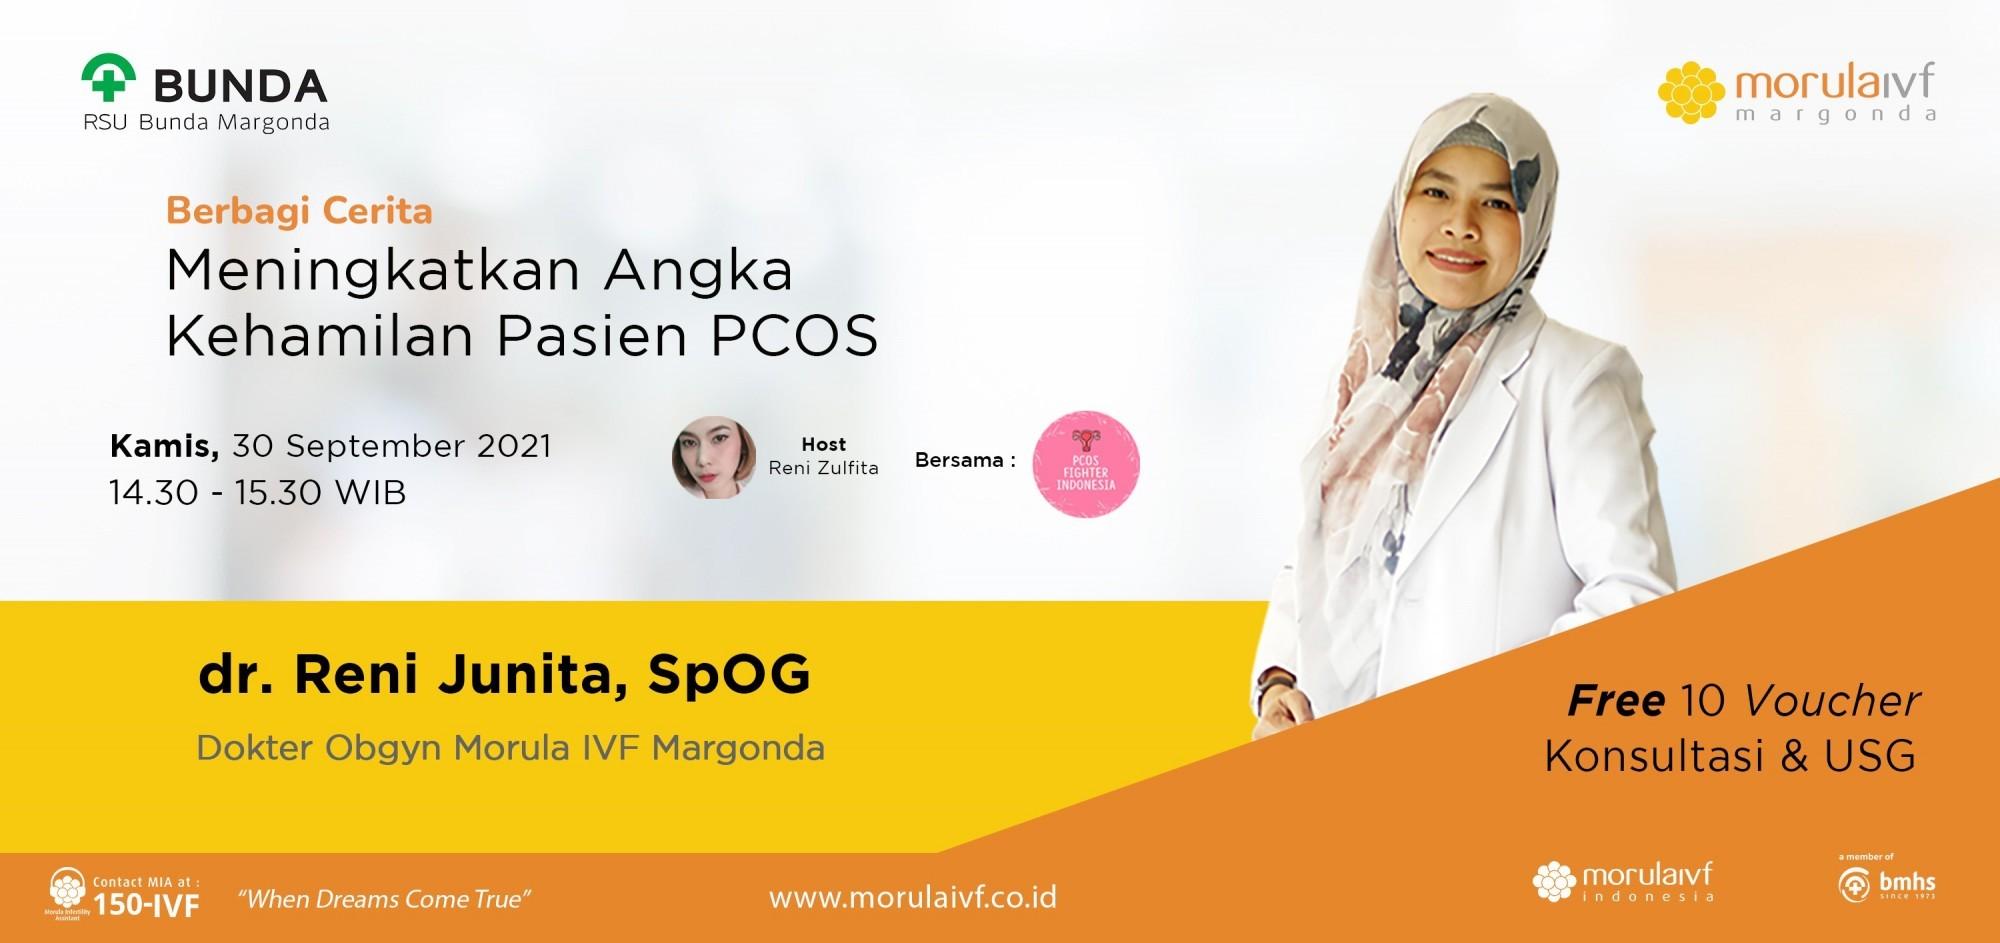 Morula Berbagi Cerita dr Reni Junita, SpOG X PCOS Fighter Indonesia